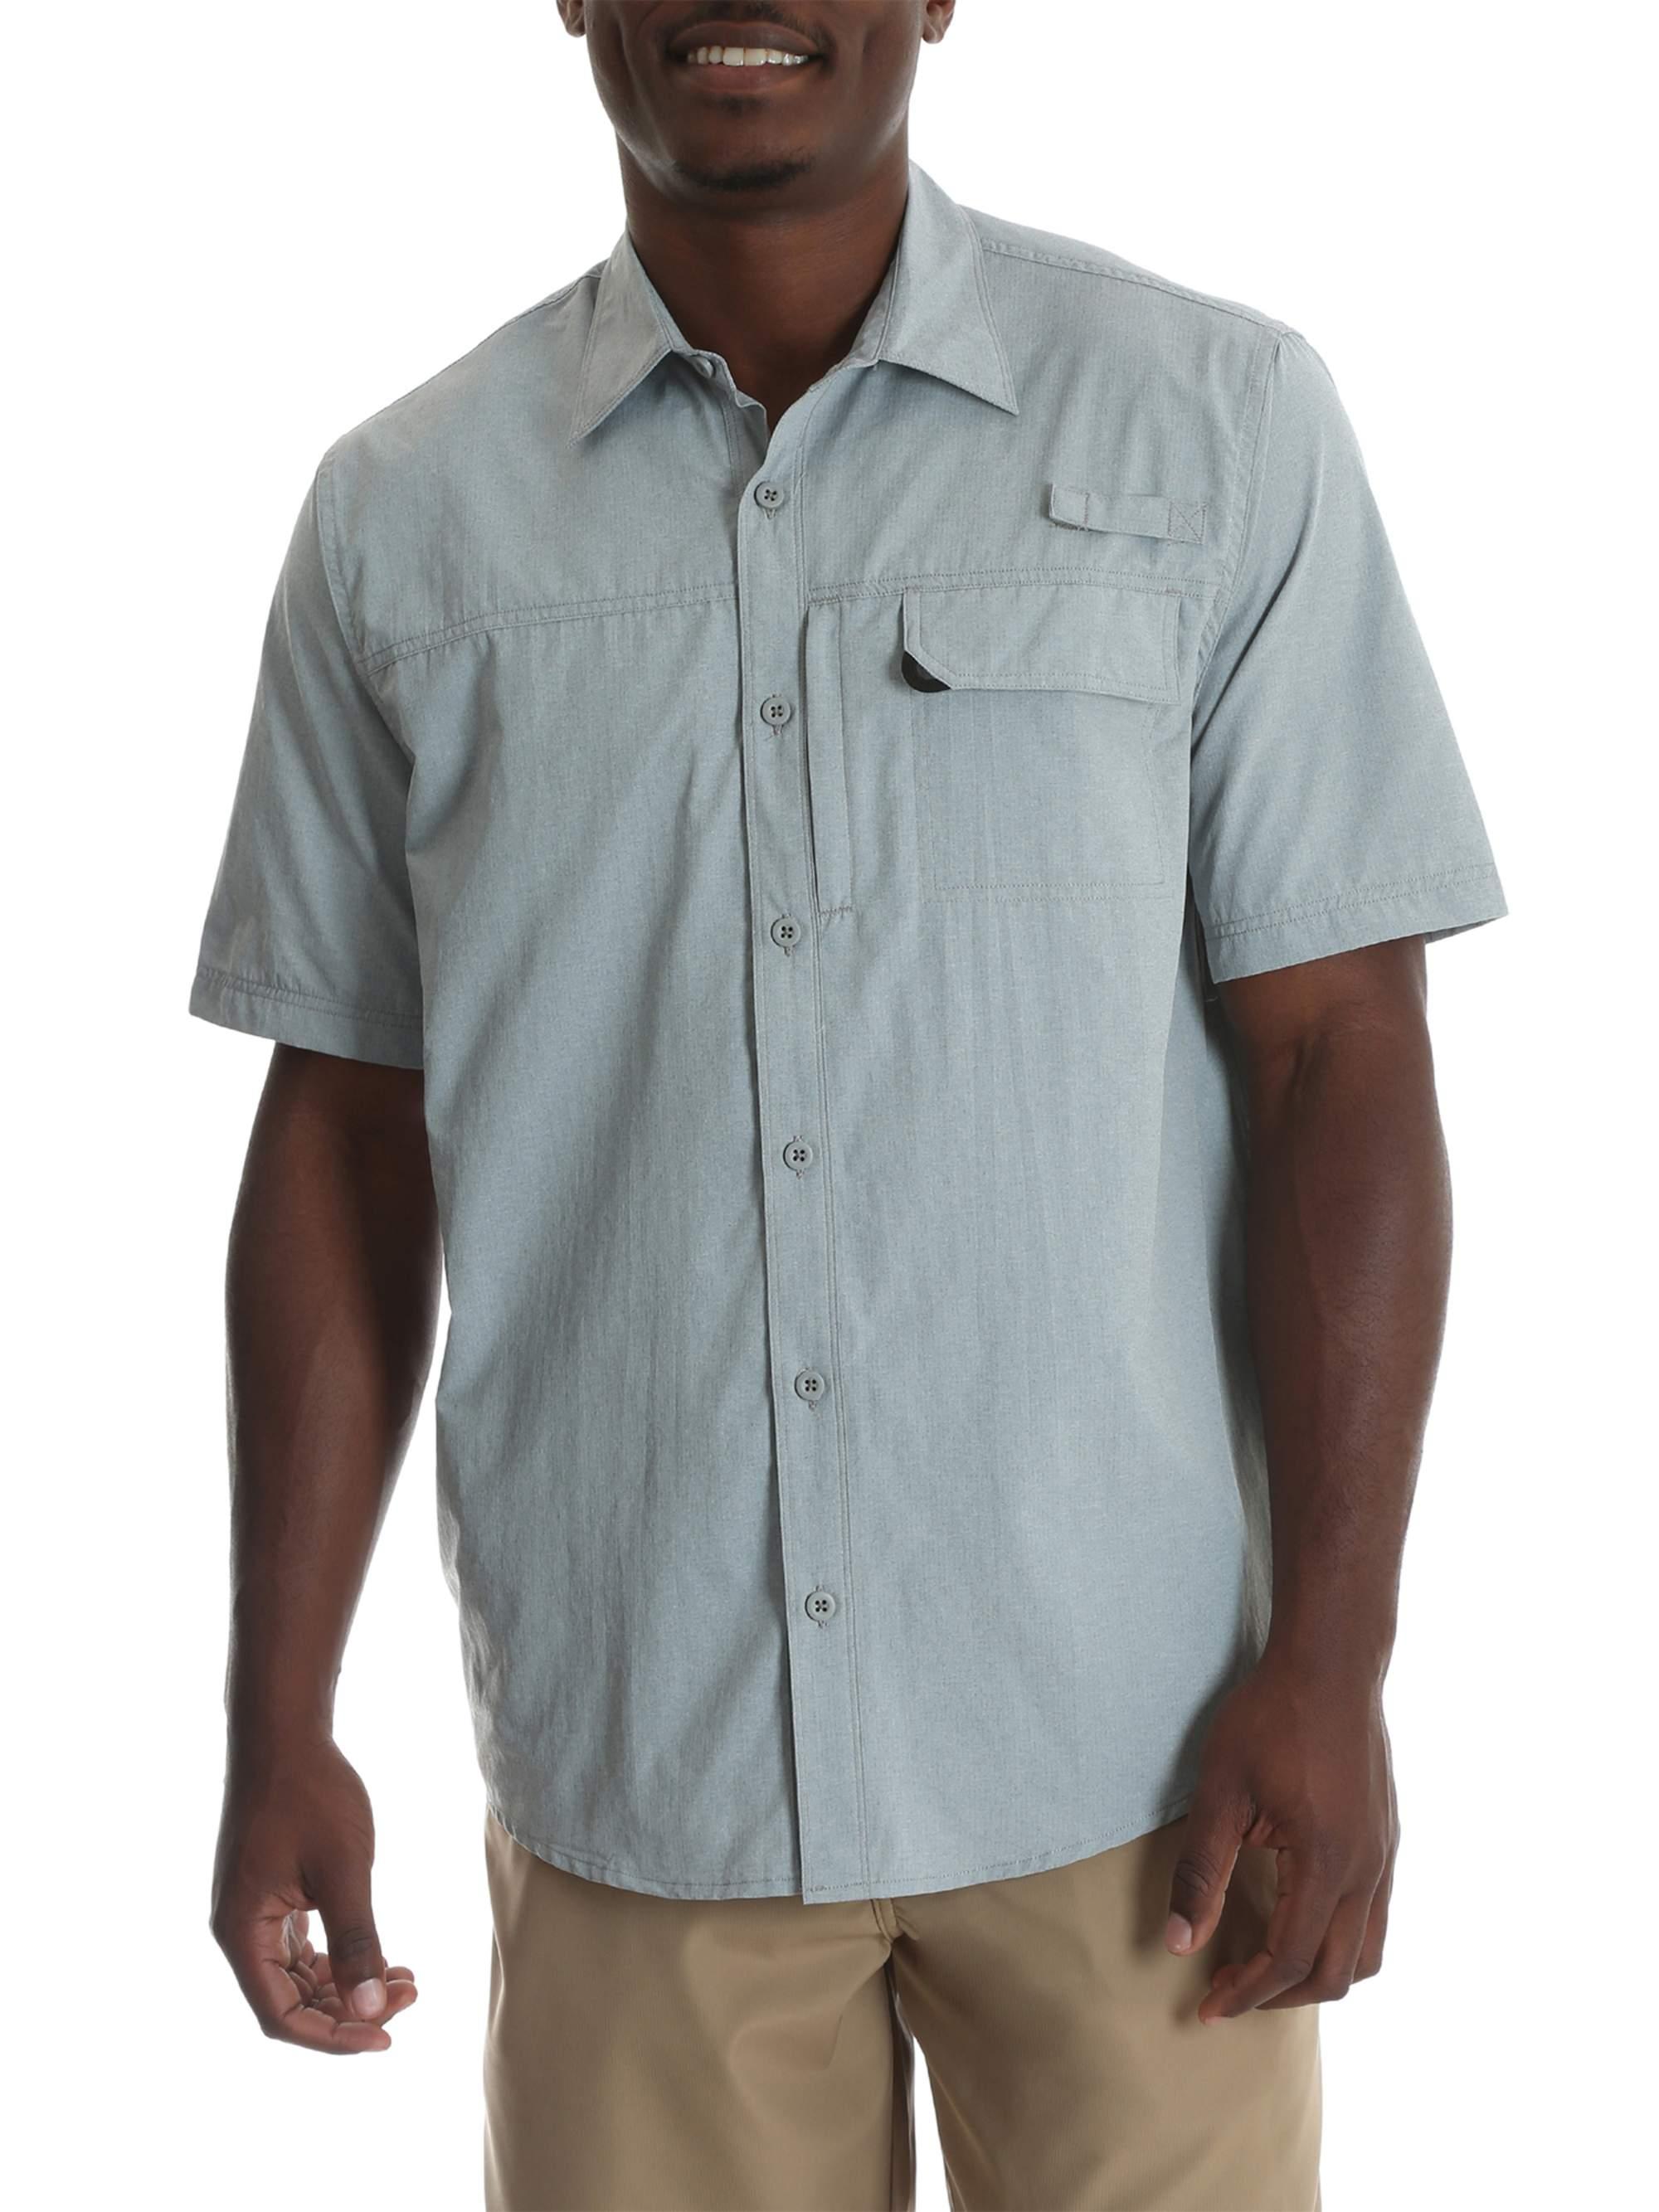 Men's Short Sleeve One Pocket Utility Shirt